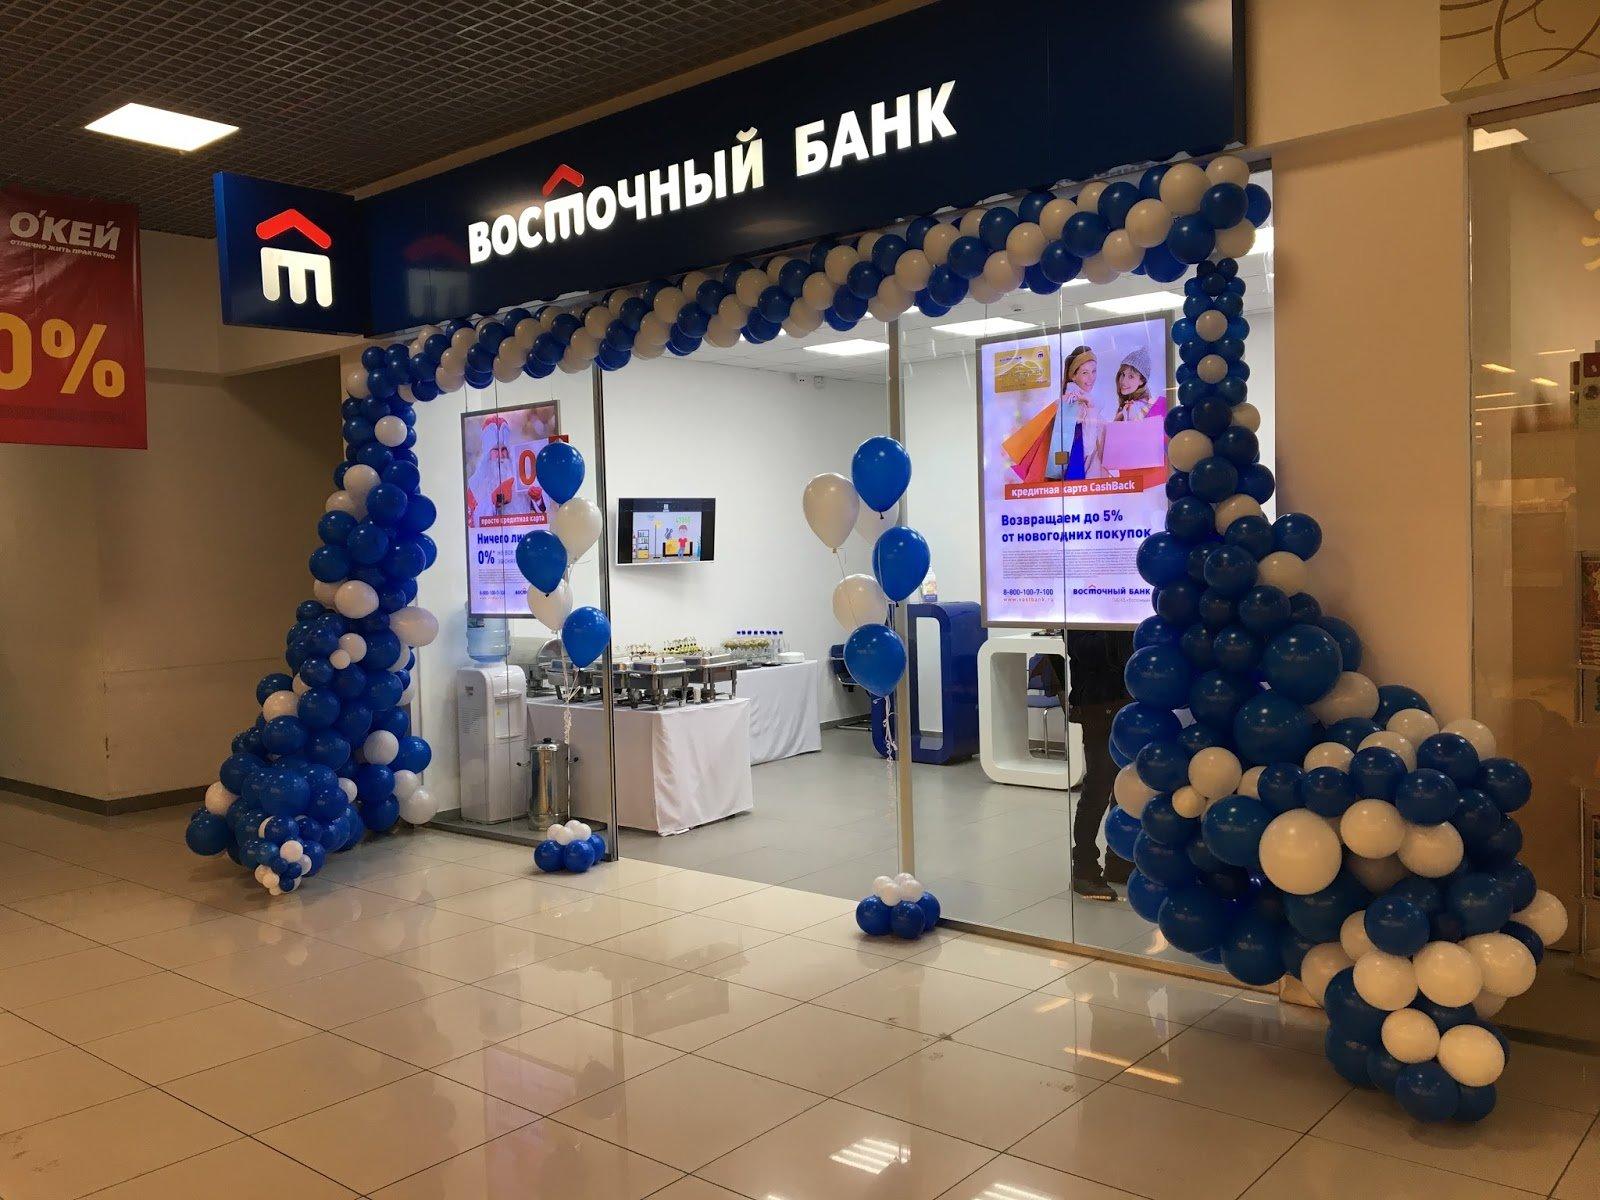 bank-vostochnyj-oplata-kredita-onlajn_14